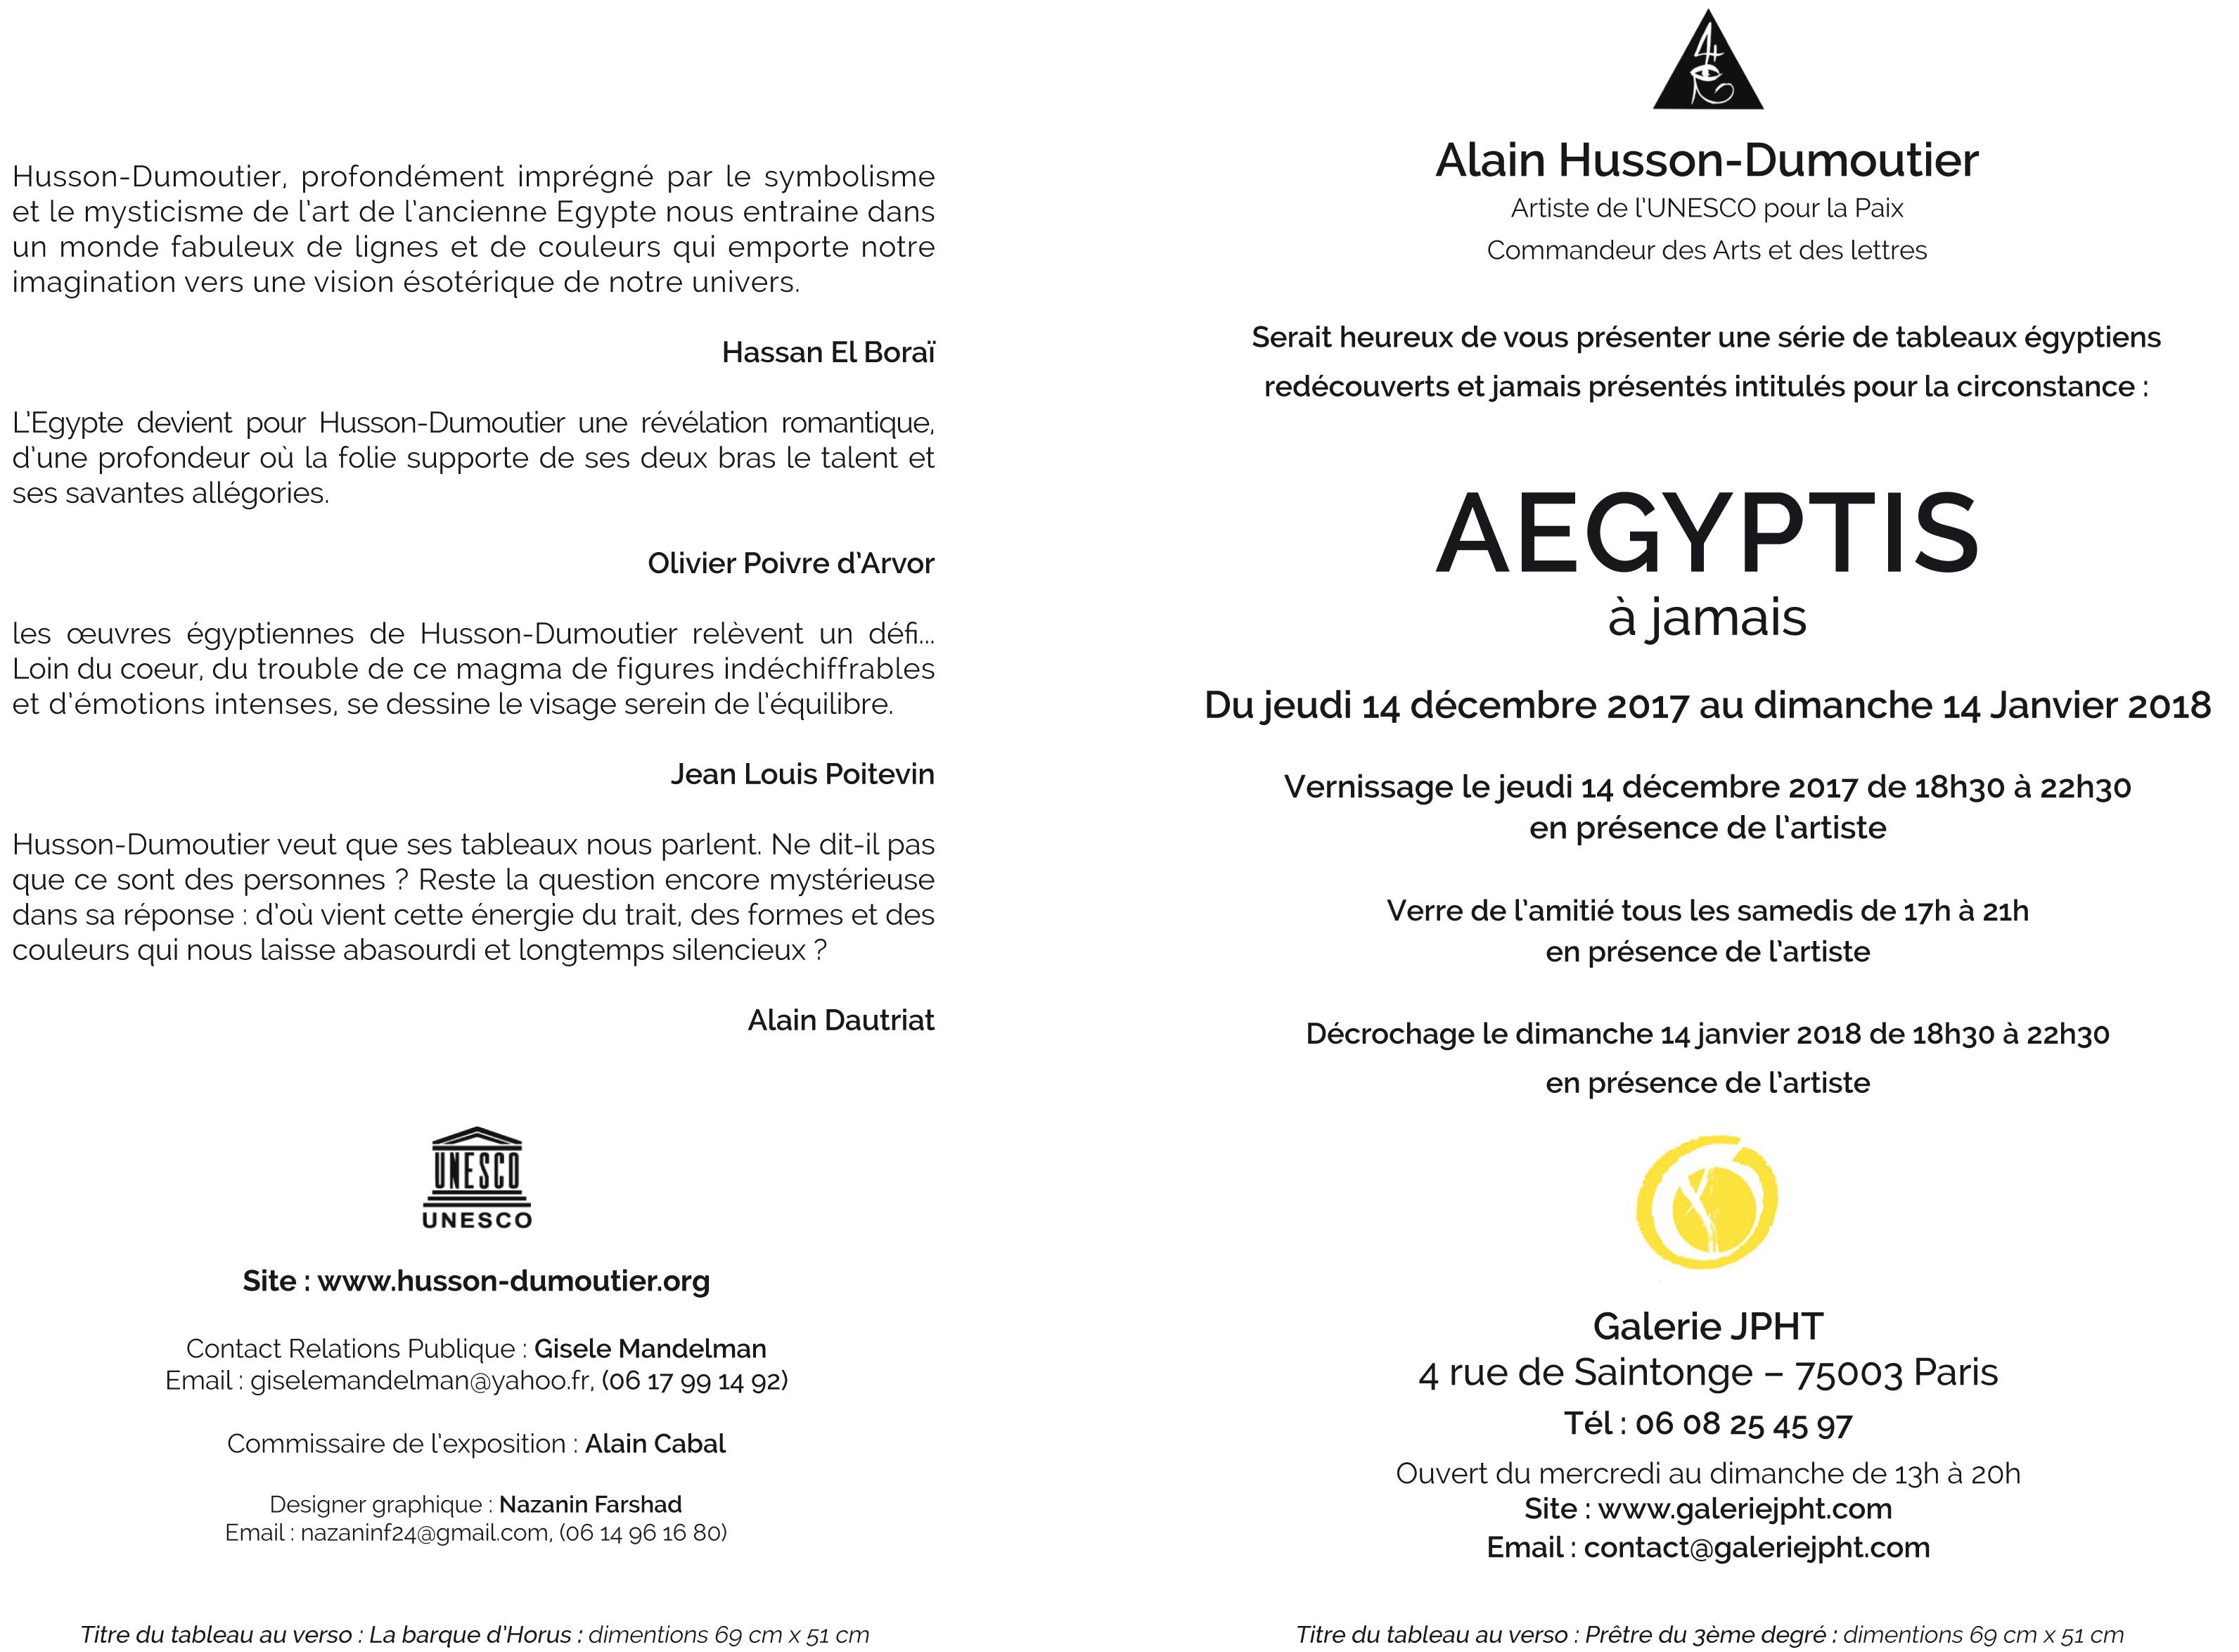 Aegyptis forever - Alain Husson-Dumoutier Alain Husson-Dumoutier